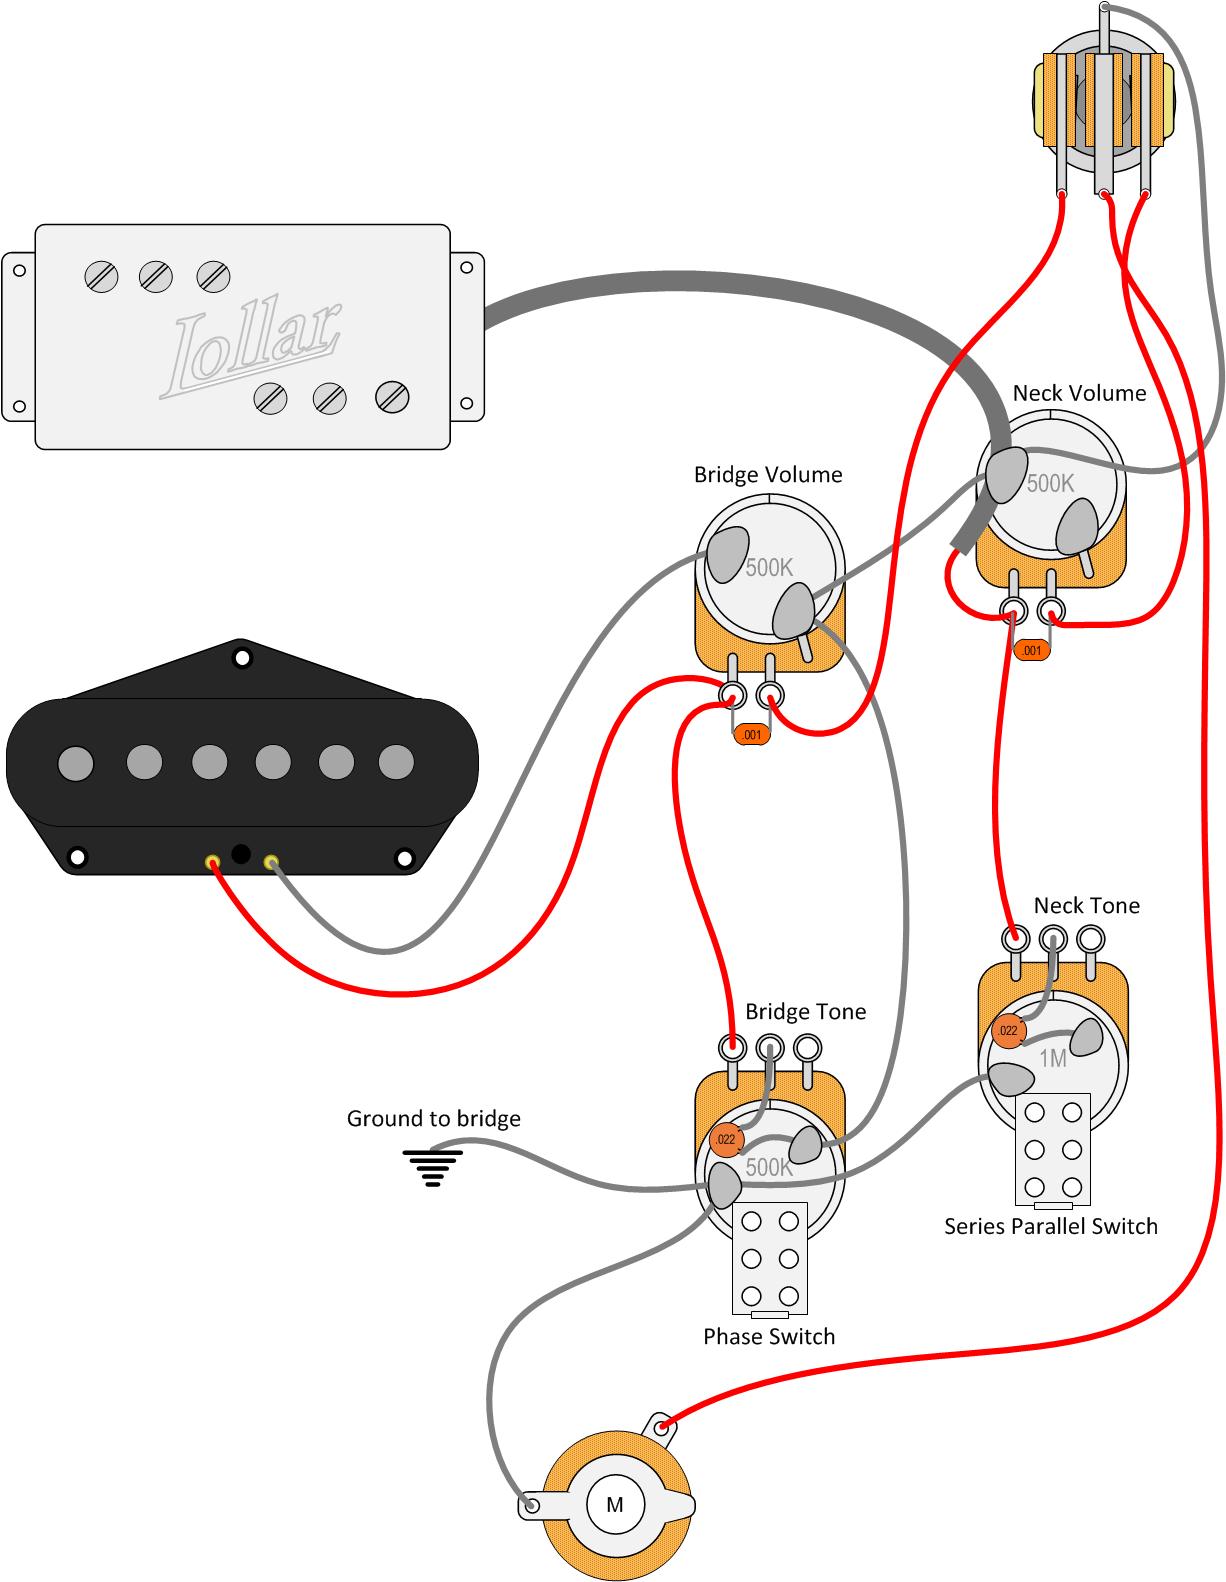 Fender Tele Deluxe Wiring Diagram - 2006 Durango Wiring Diagrams  sonycdx-wirings.au-delice-limousin.fr   72 Telecaster Wiring Diagram      Bege Wiring Diagram - Bege Wiring Diagram Full Edition